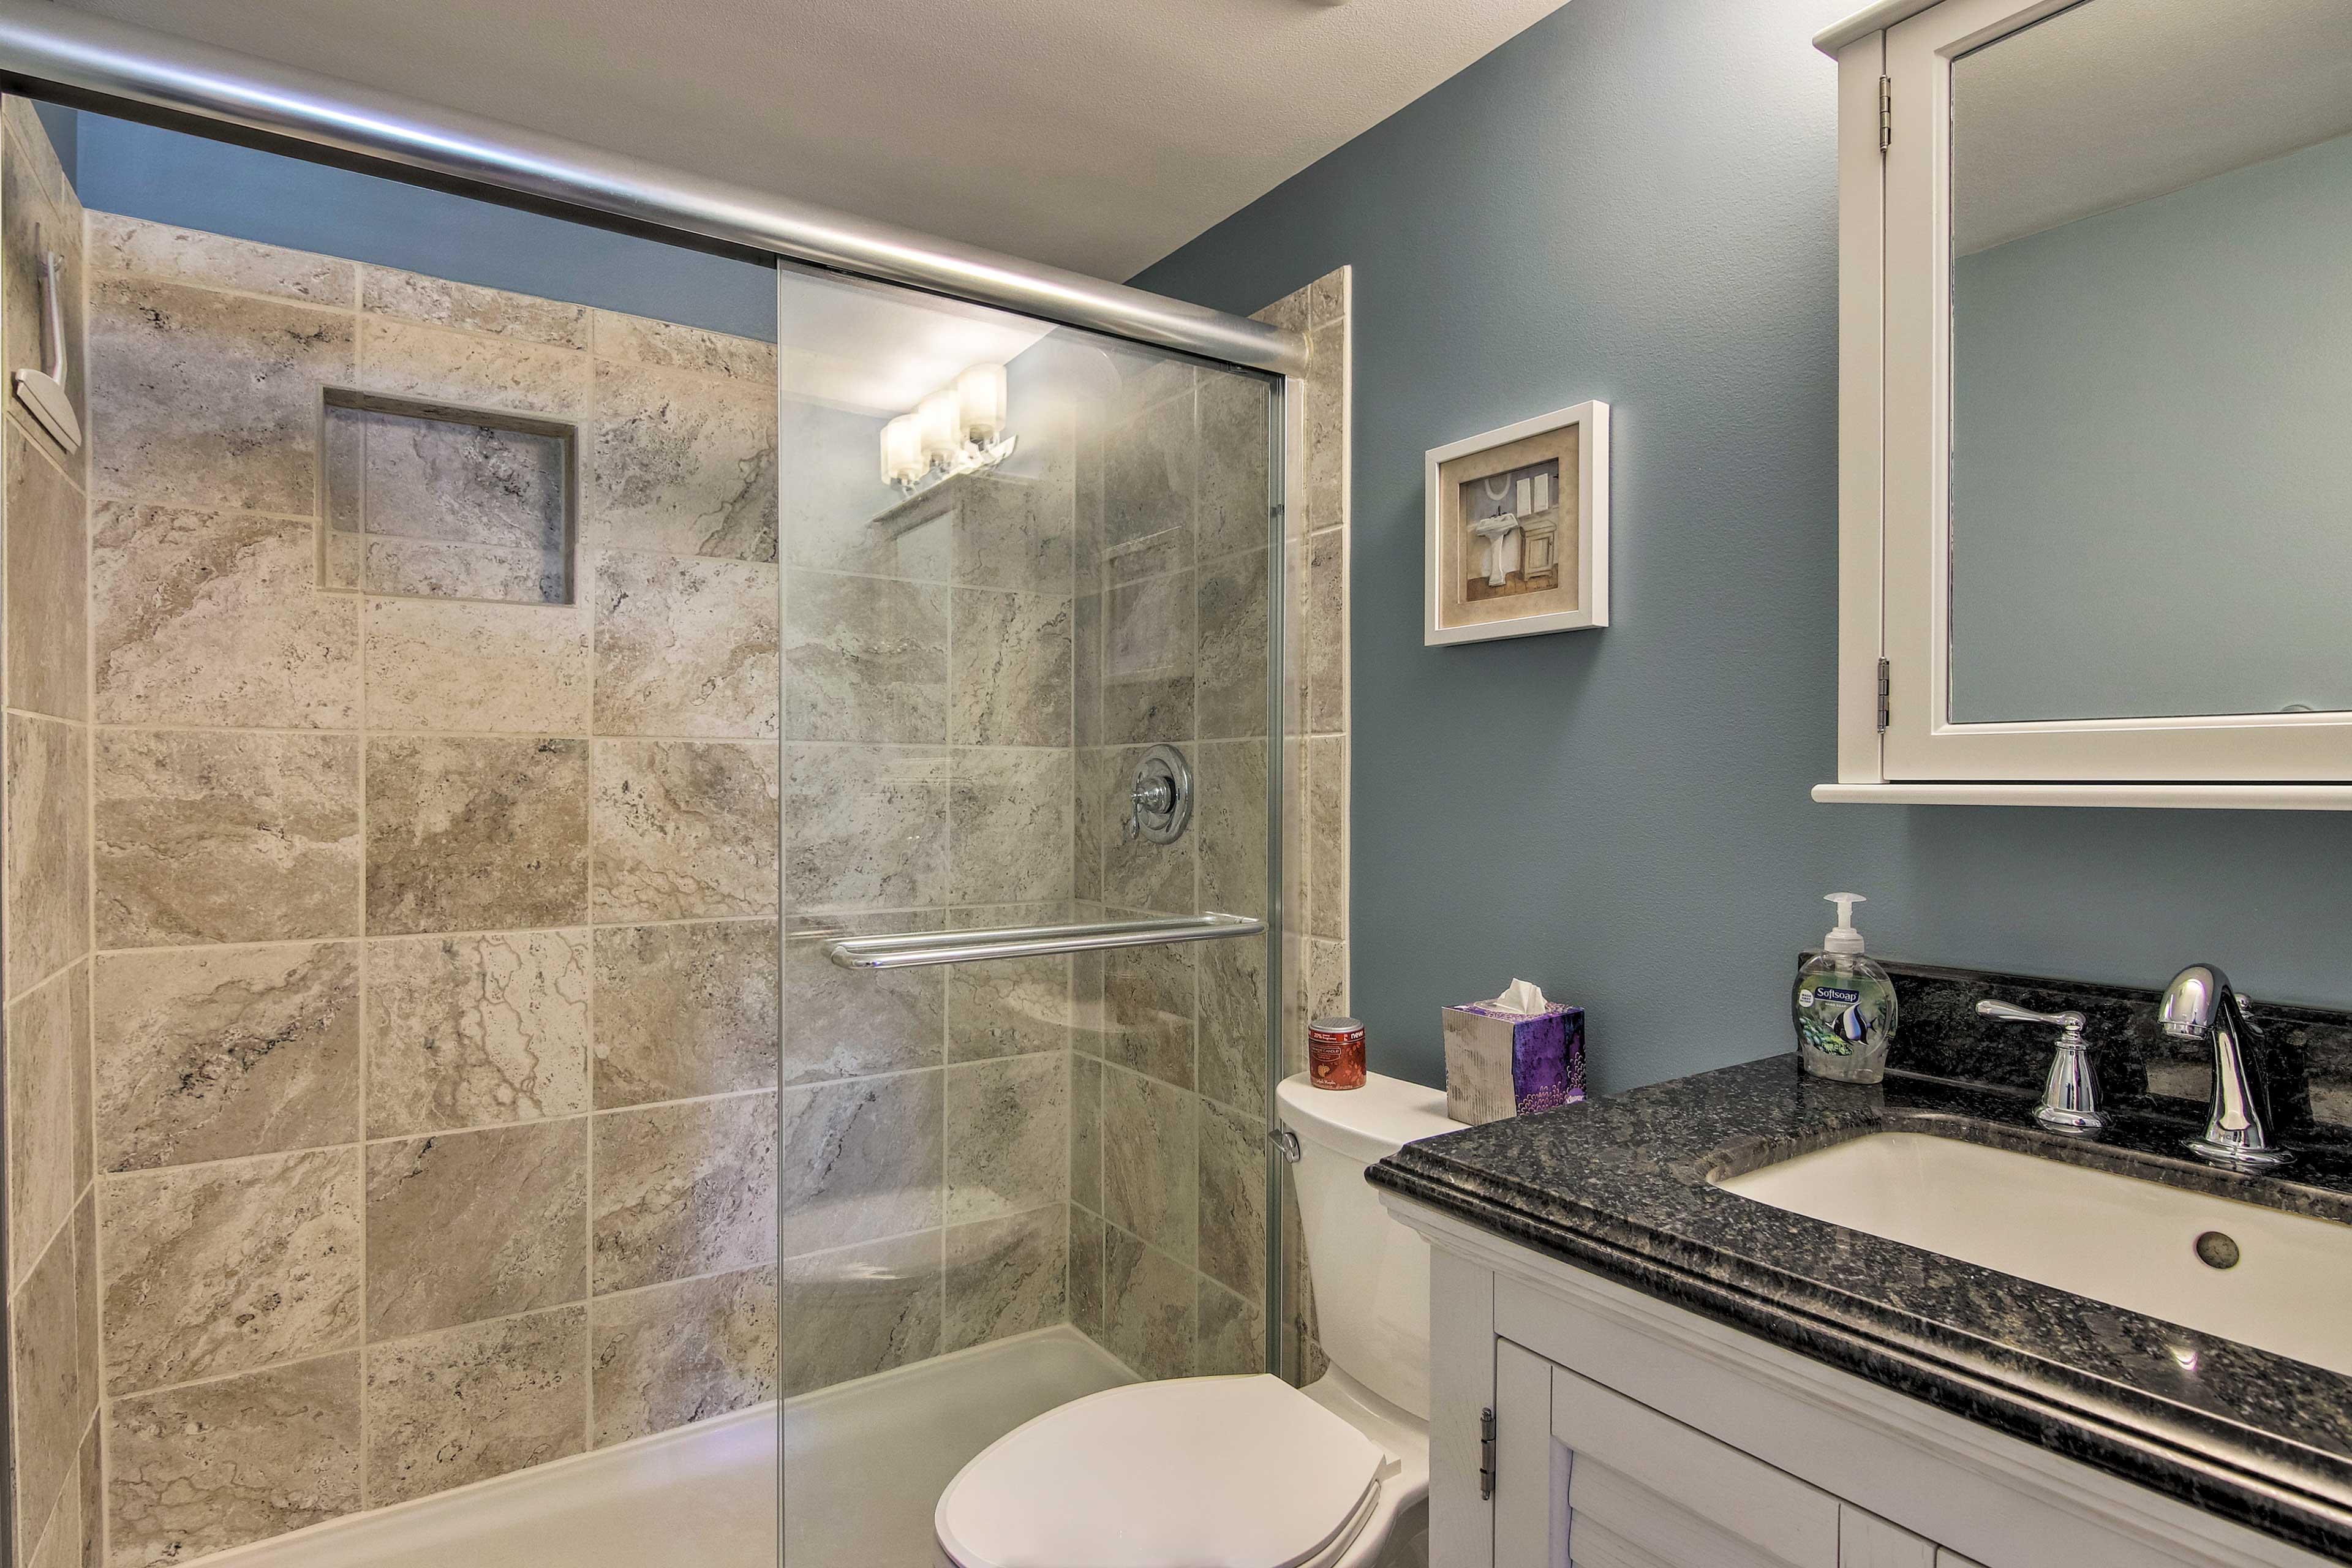 The master bedroom features a private en-suite bathroom.